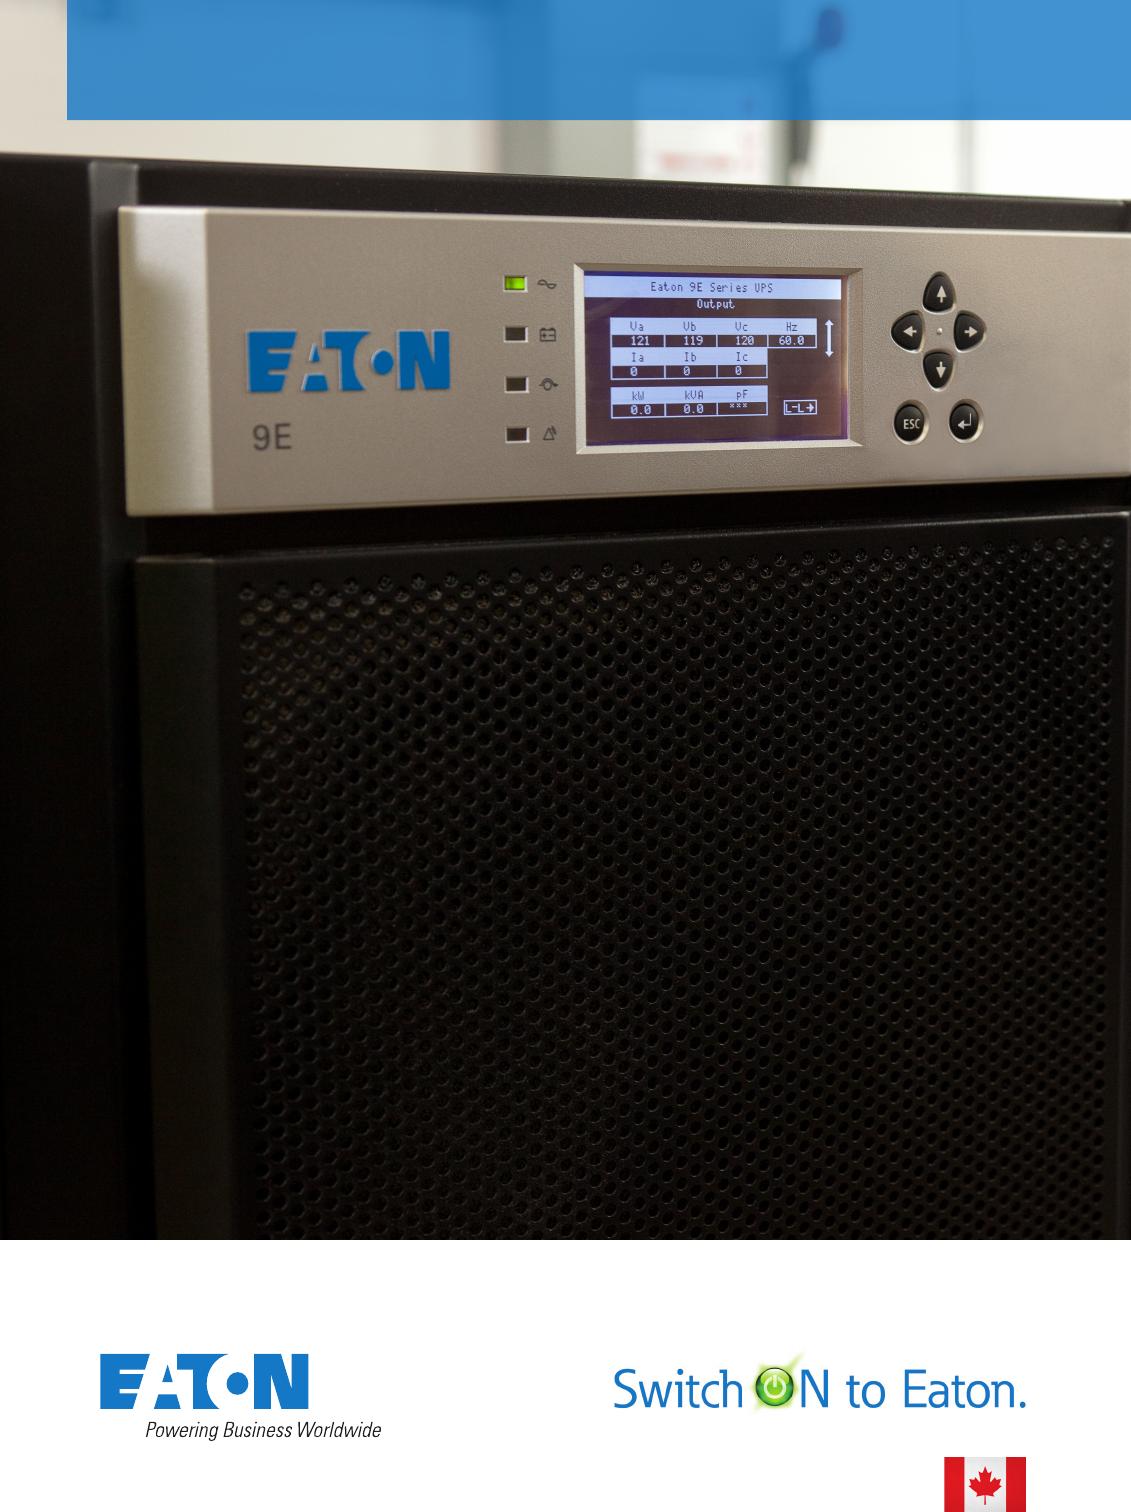 1.92 kW s - 1U - AC 120 V Eaton EPBZ99 ePDU Basic rack-mountable Power distribution unit 12 output connector